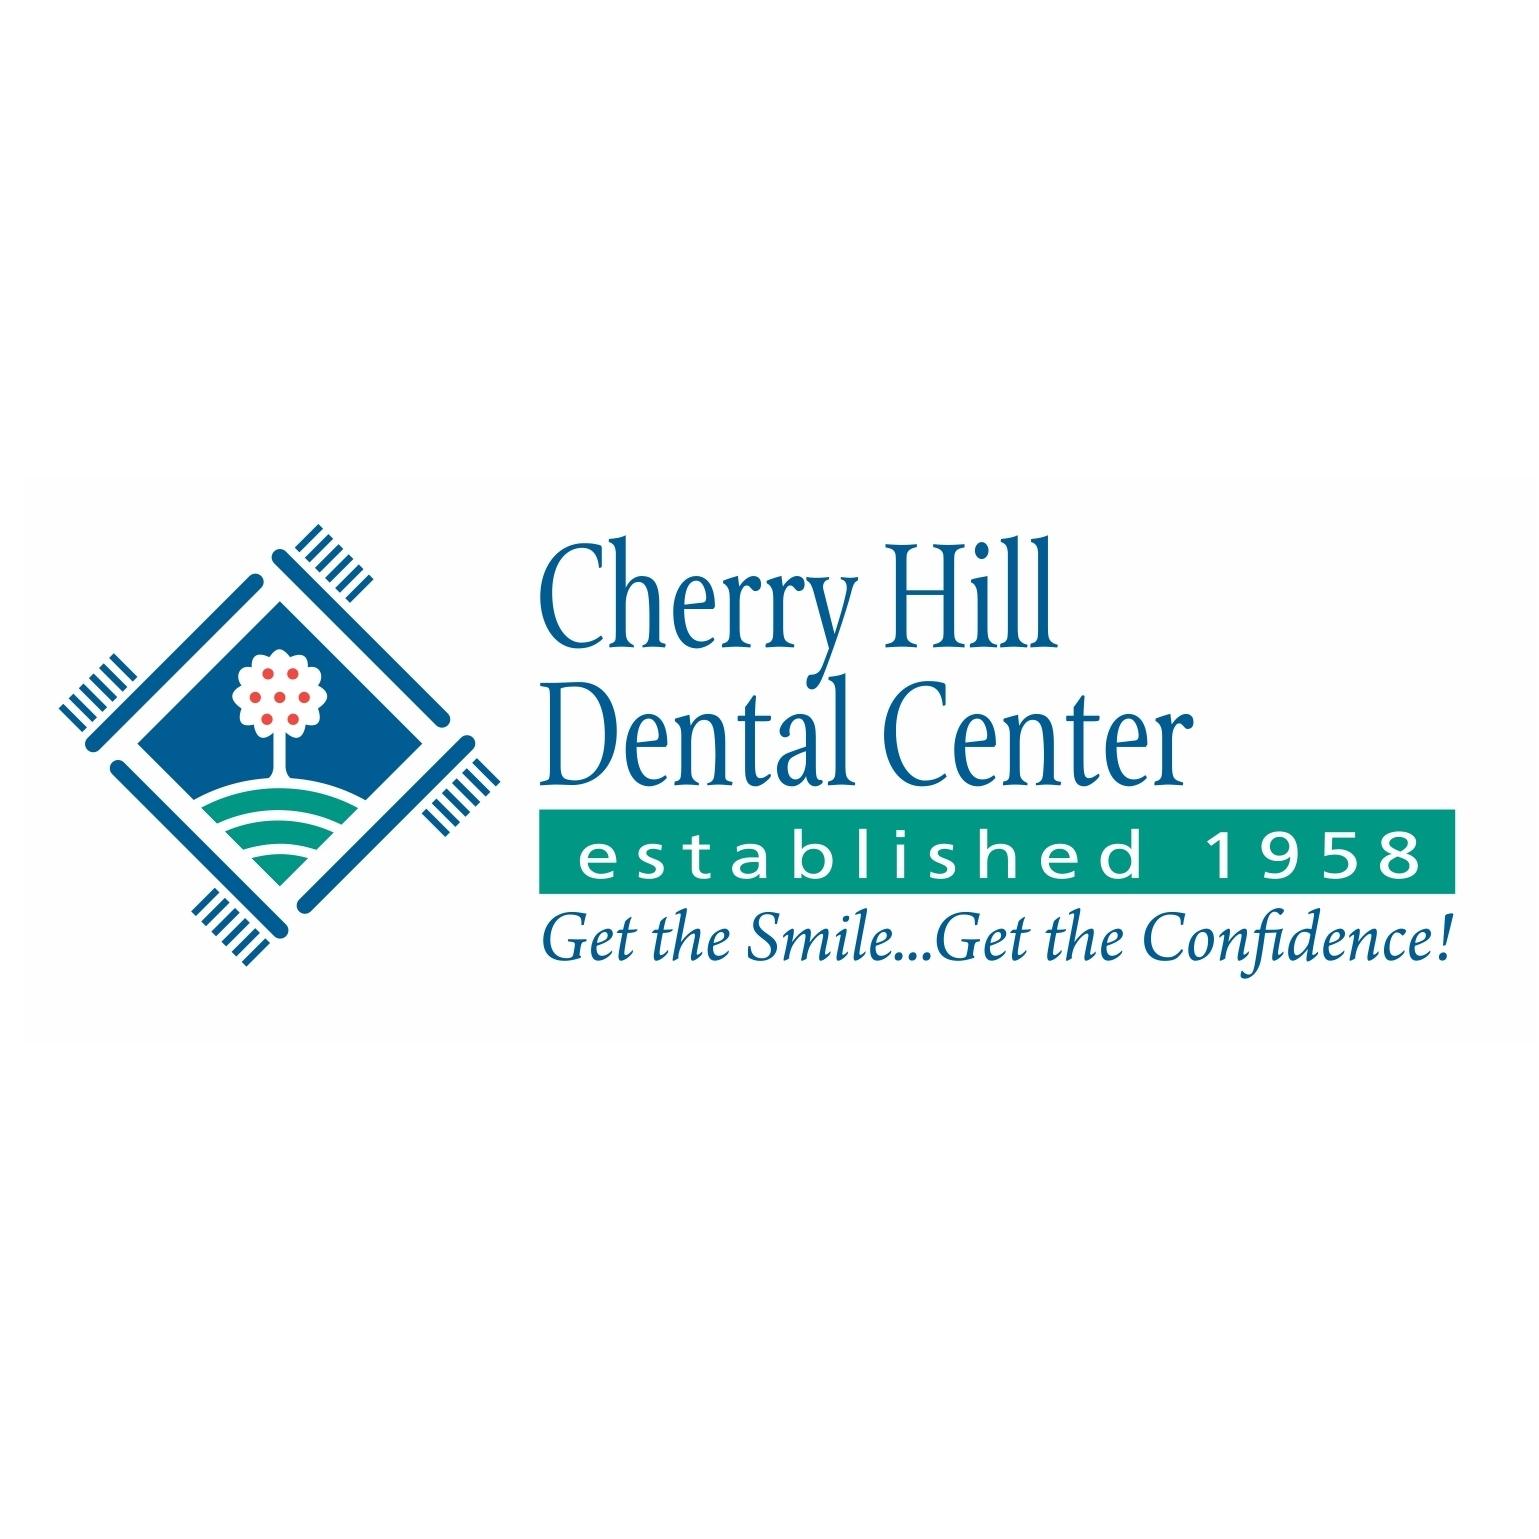 Cosmetic Dentist in MI Garden City 48135 Cherry Hill Dental Center 27676 Cherry Hill Rd  (734)236-6784